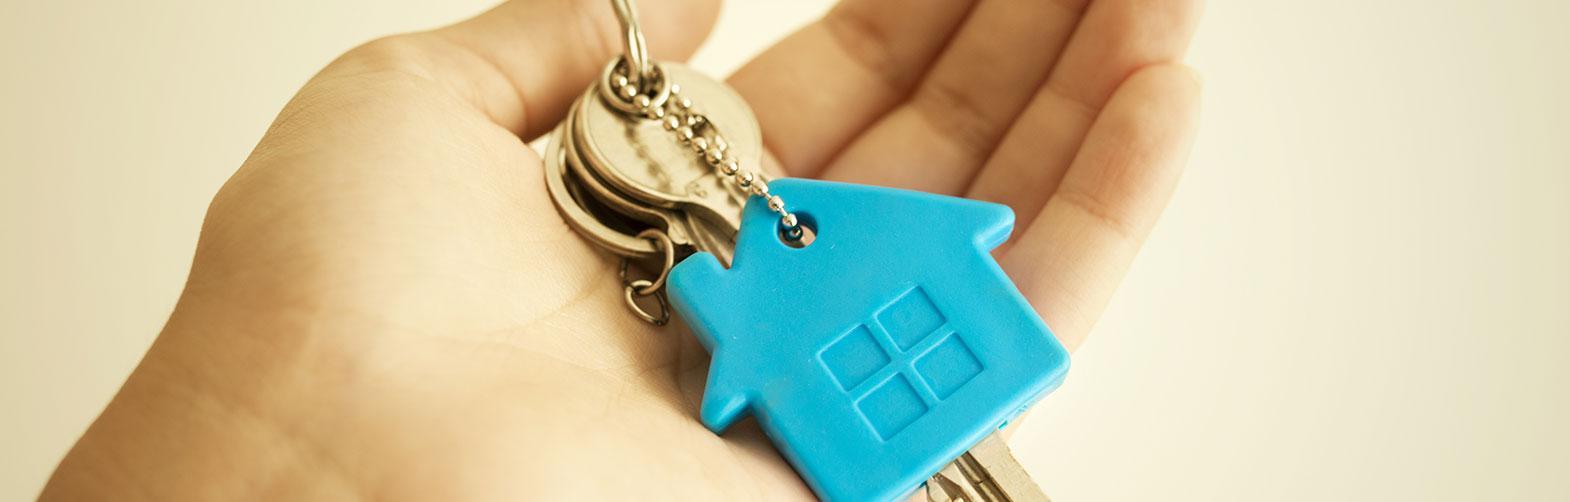 huisvesting_0.jpg